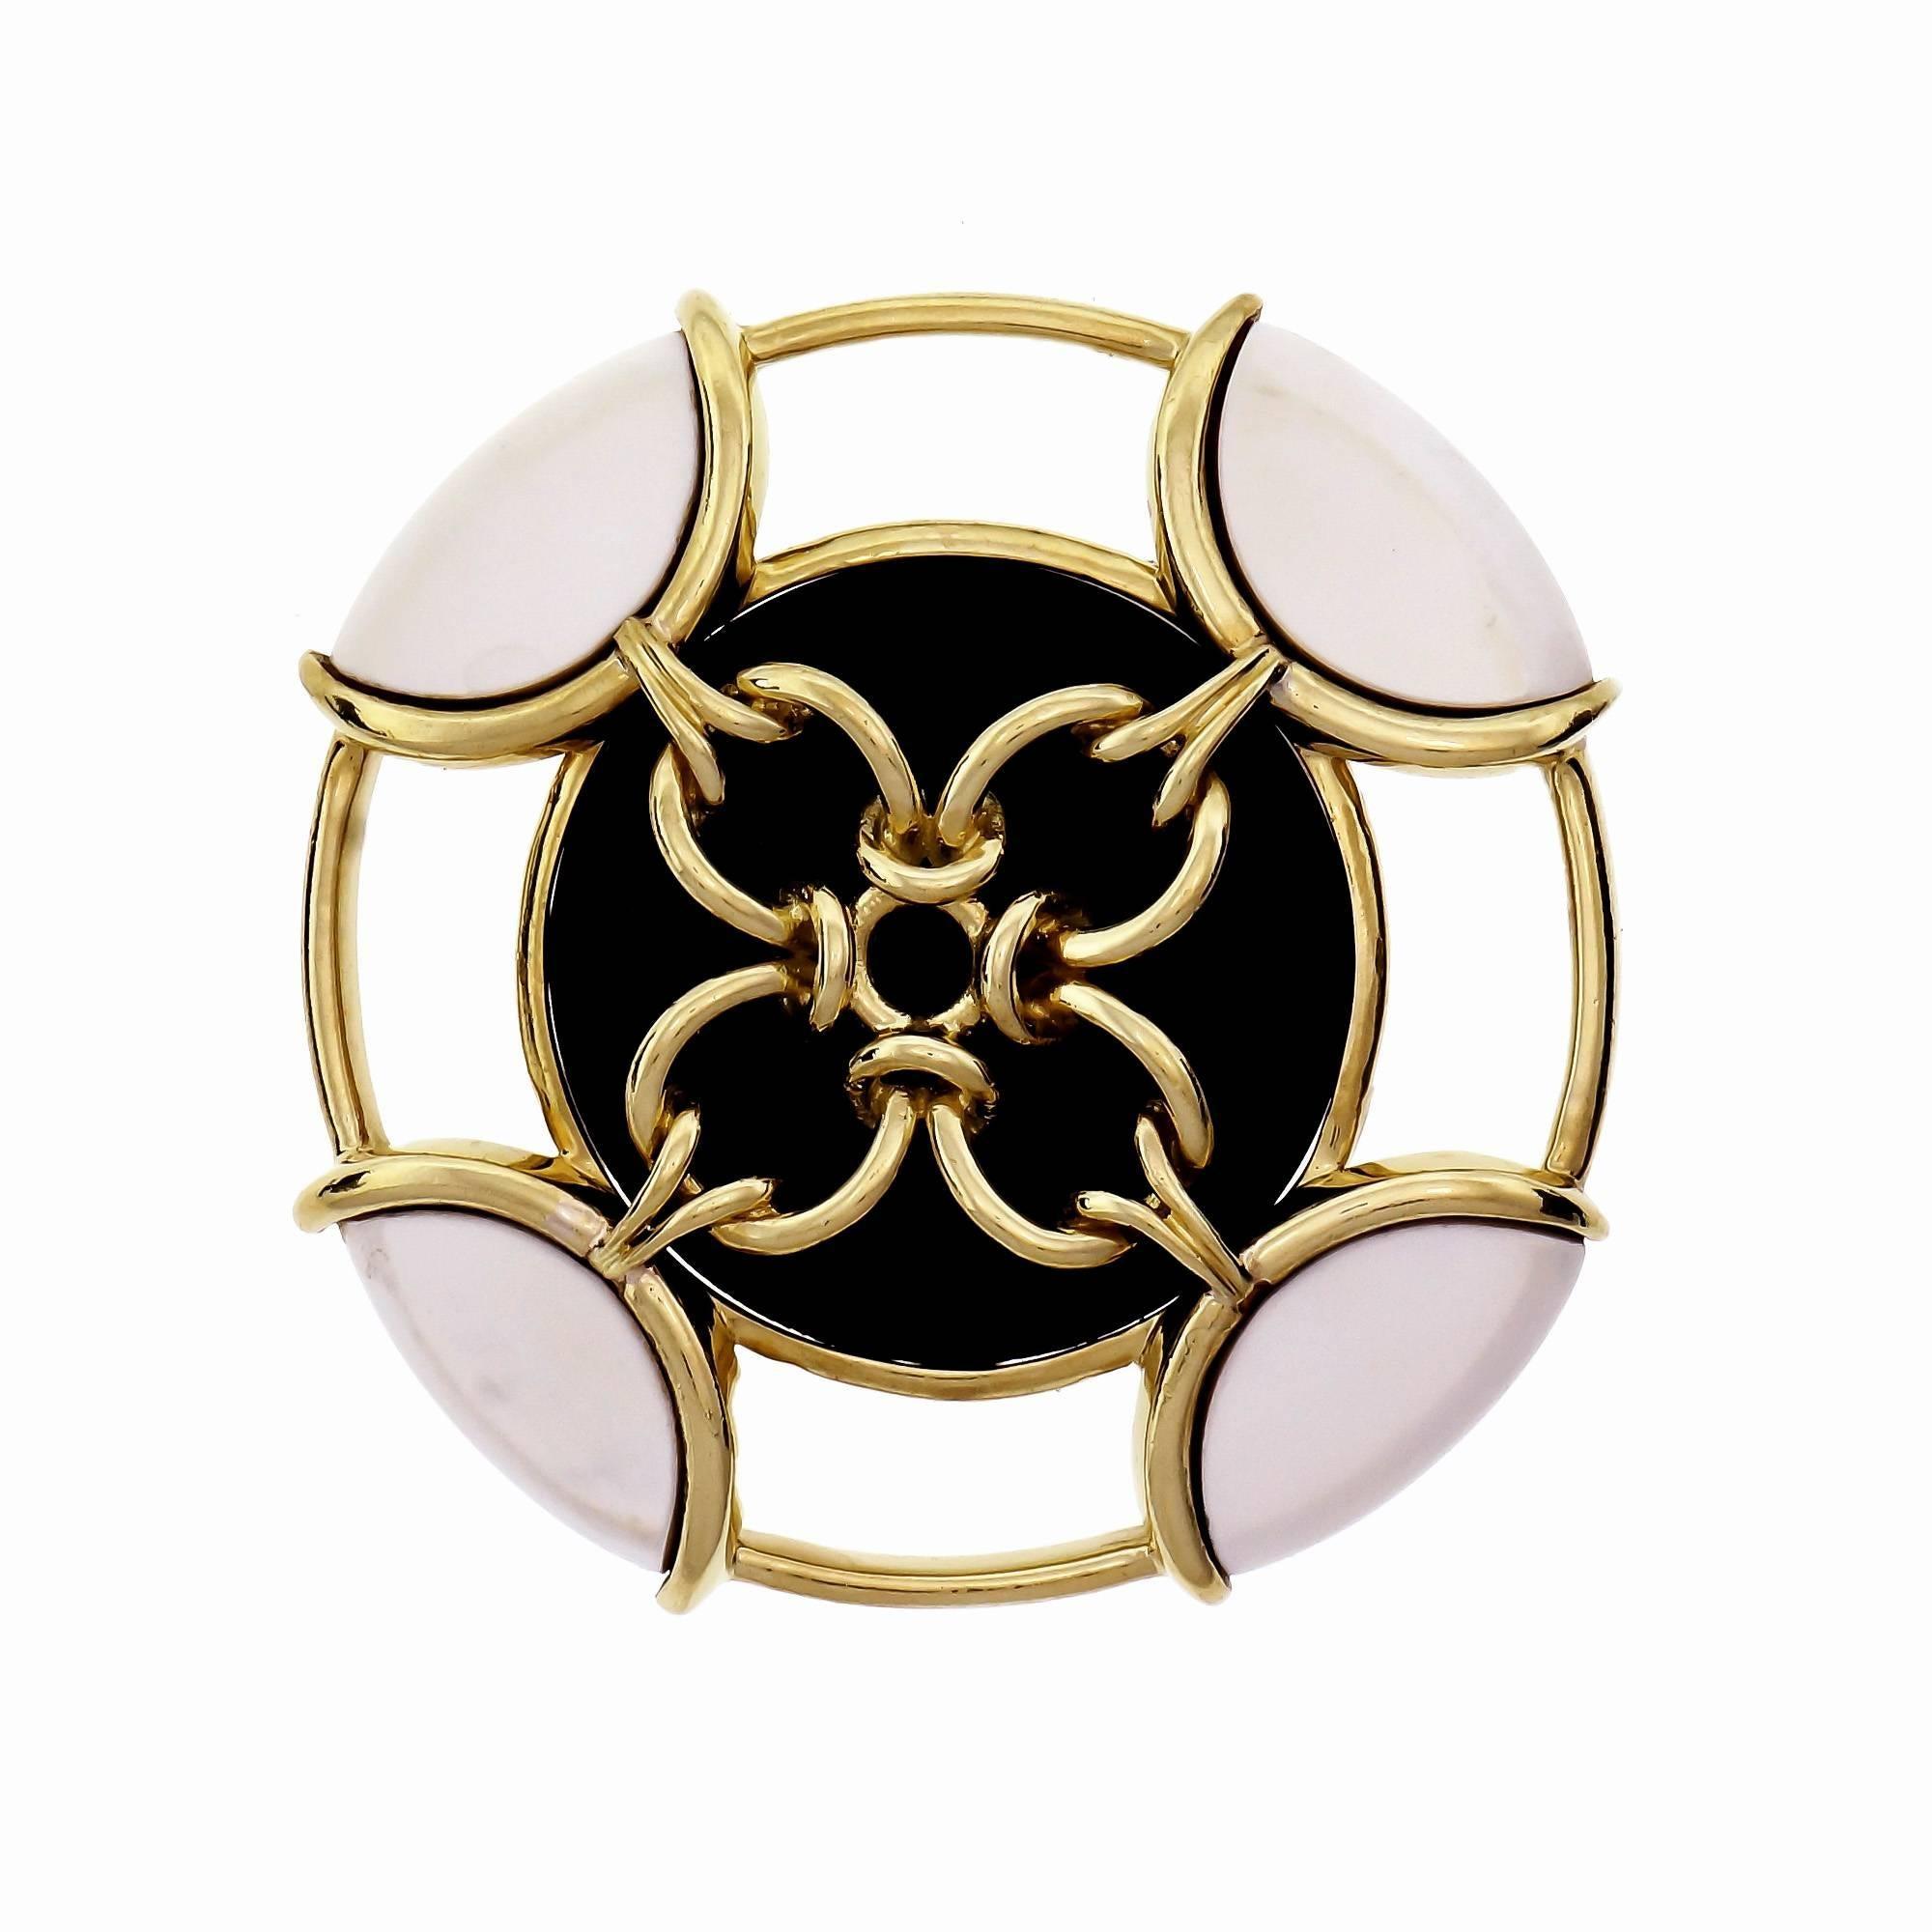 Tiffany & Co. Onyx Pristine Gold Brooch Pendant